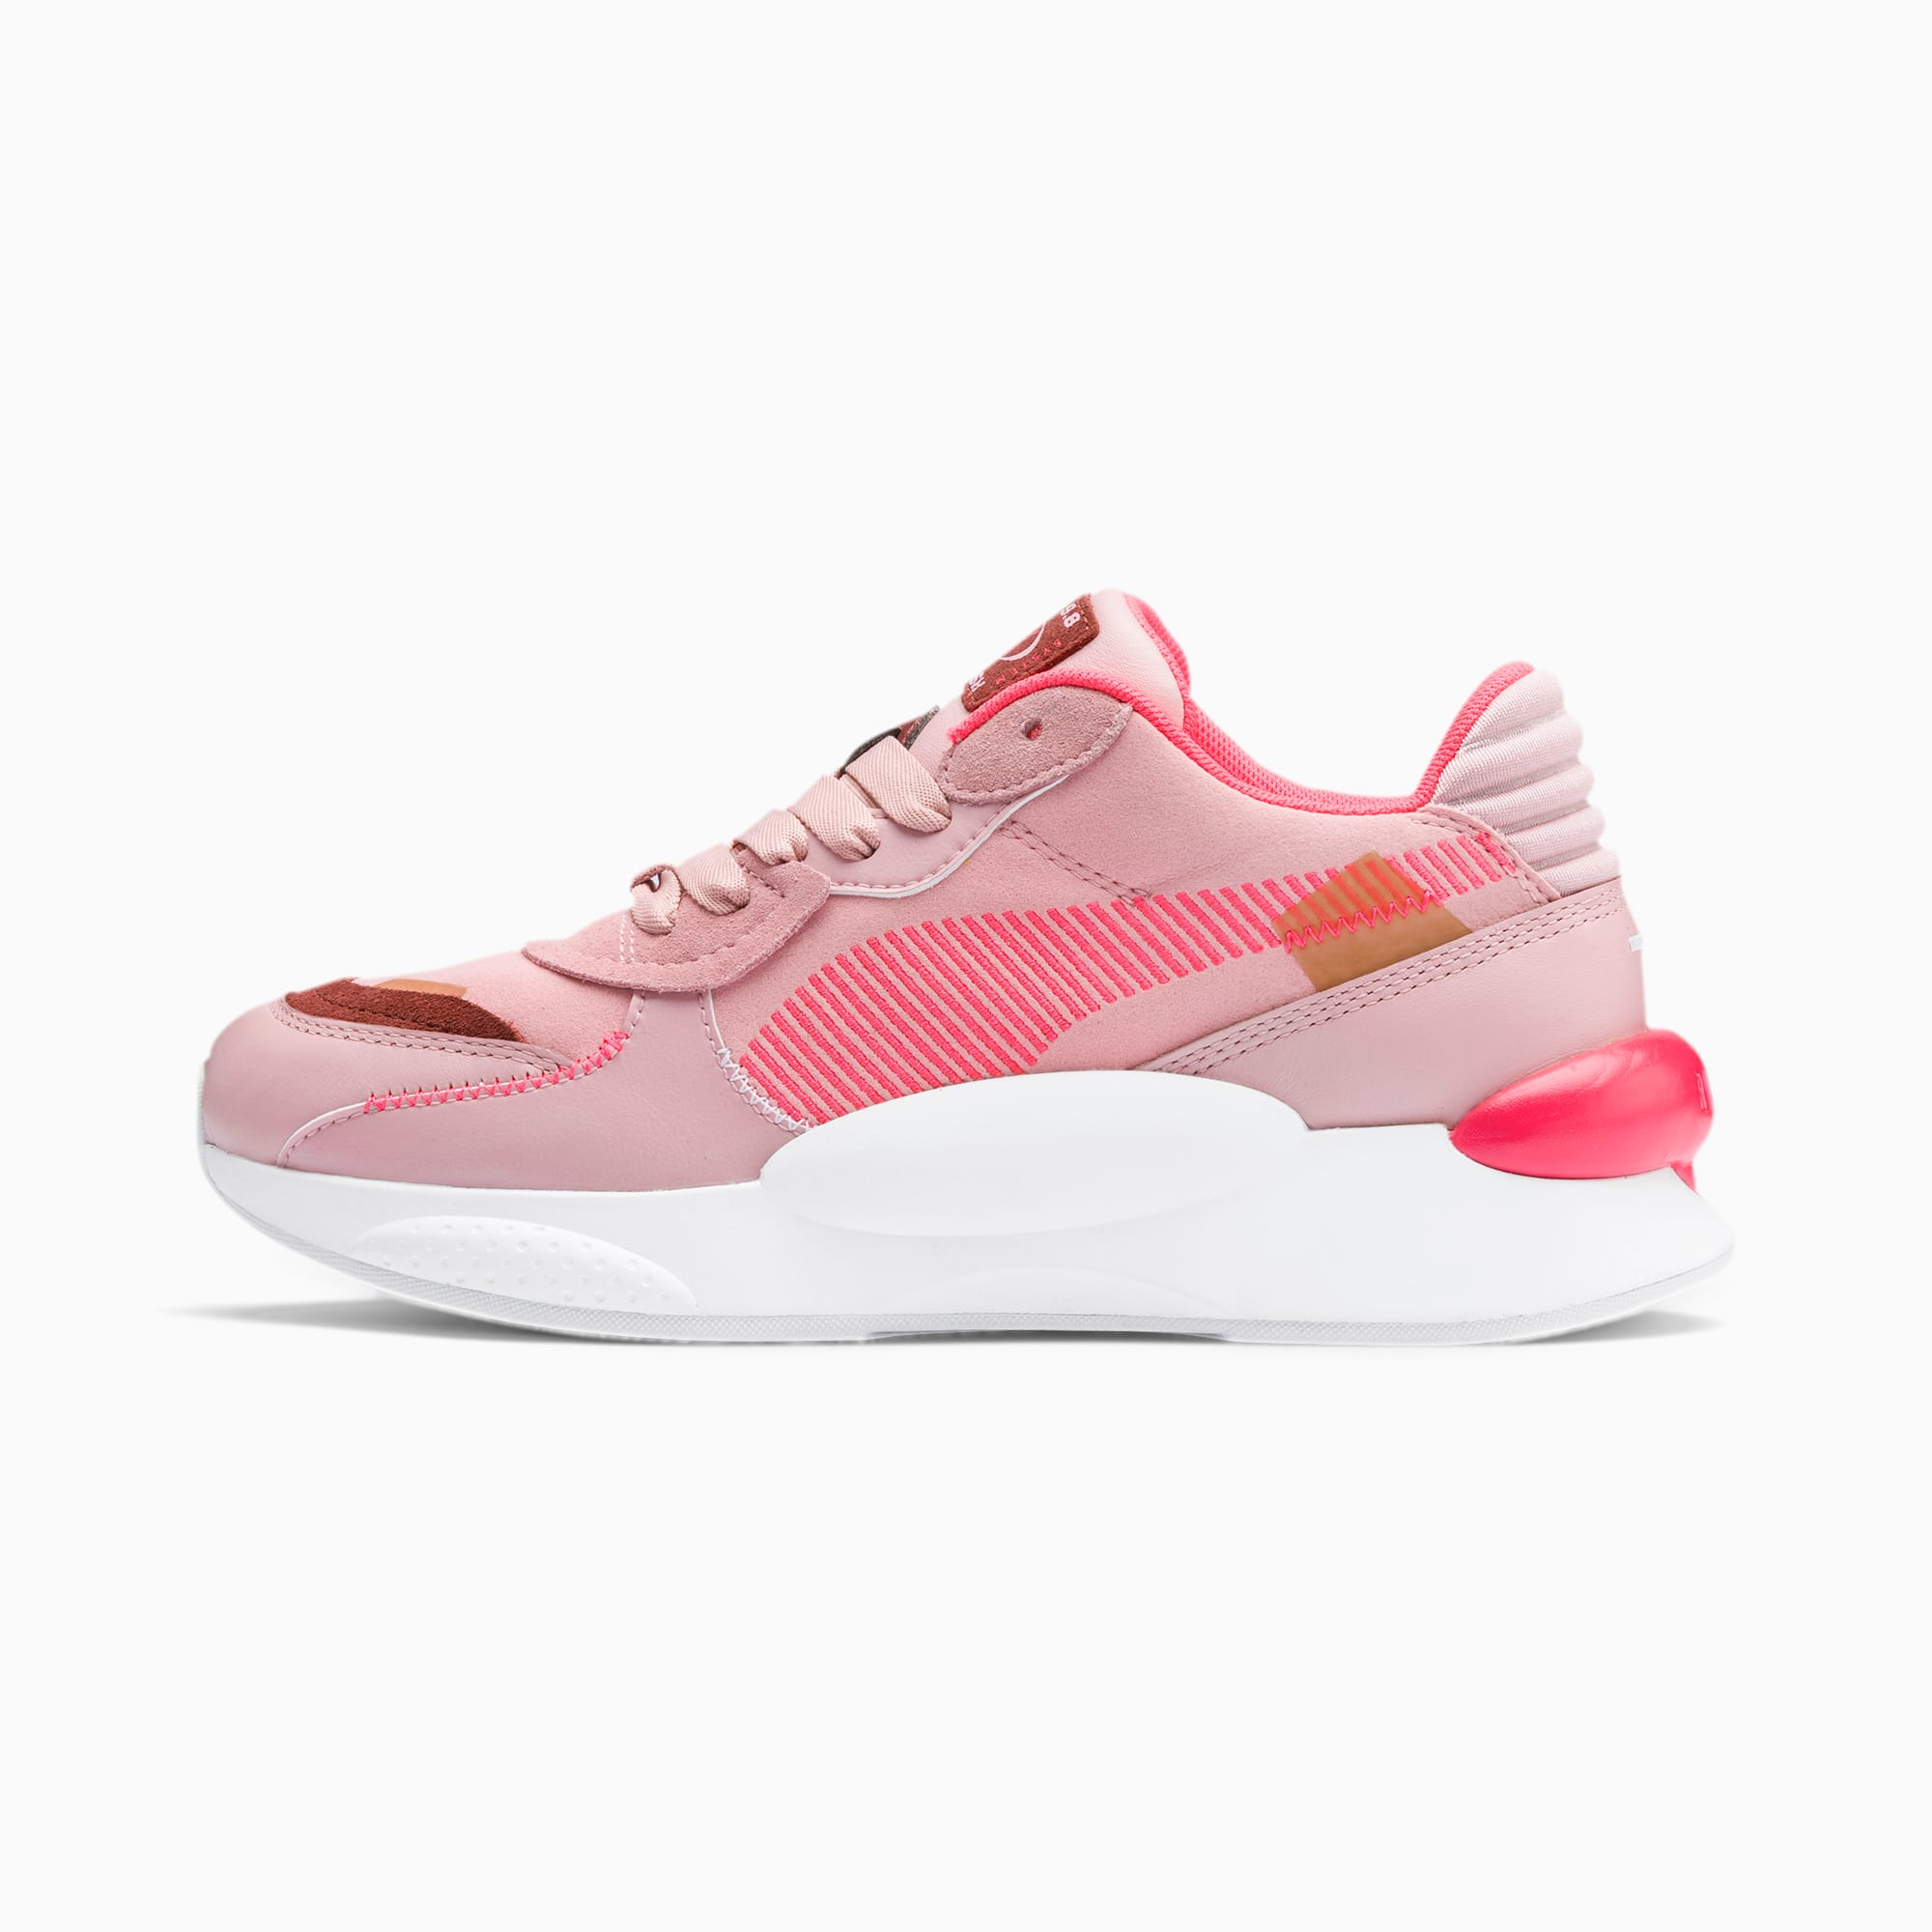 Puma Defy Women's Sneakers Review